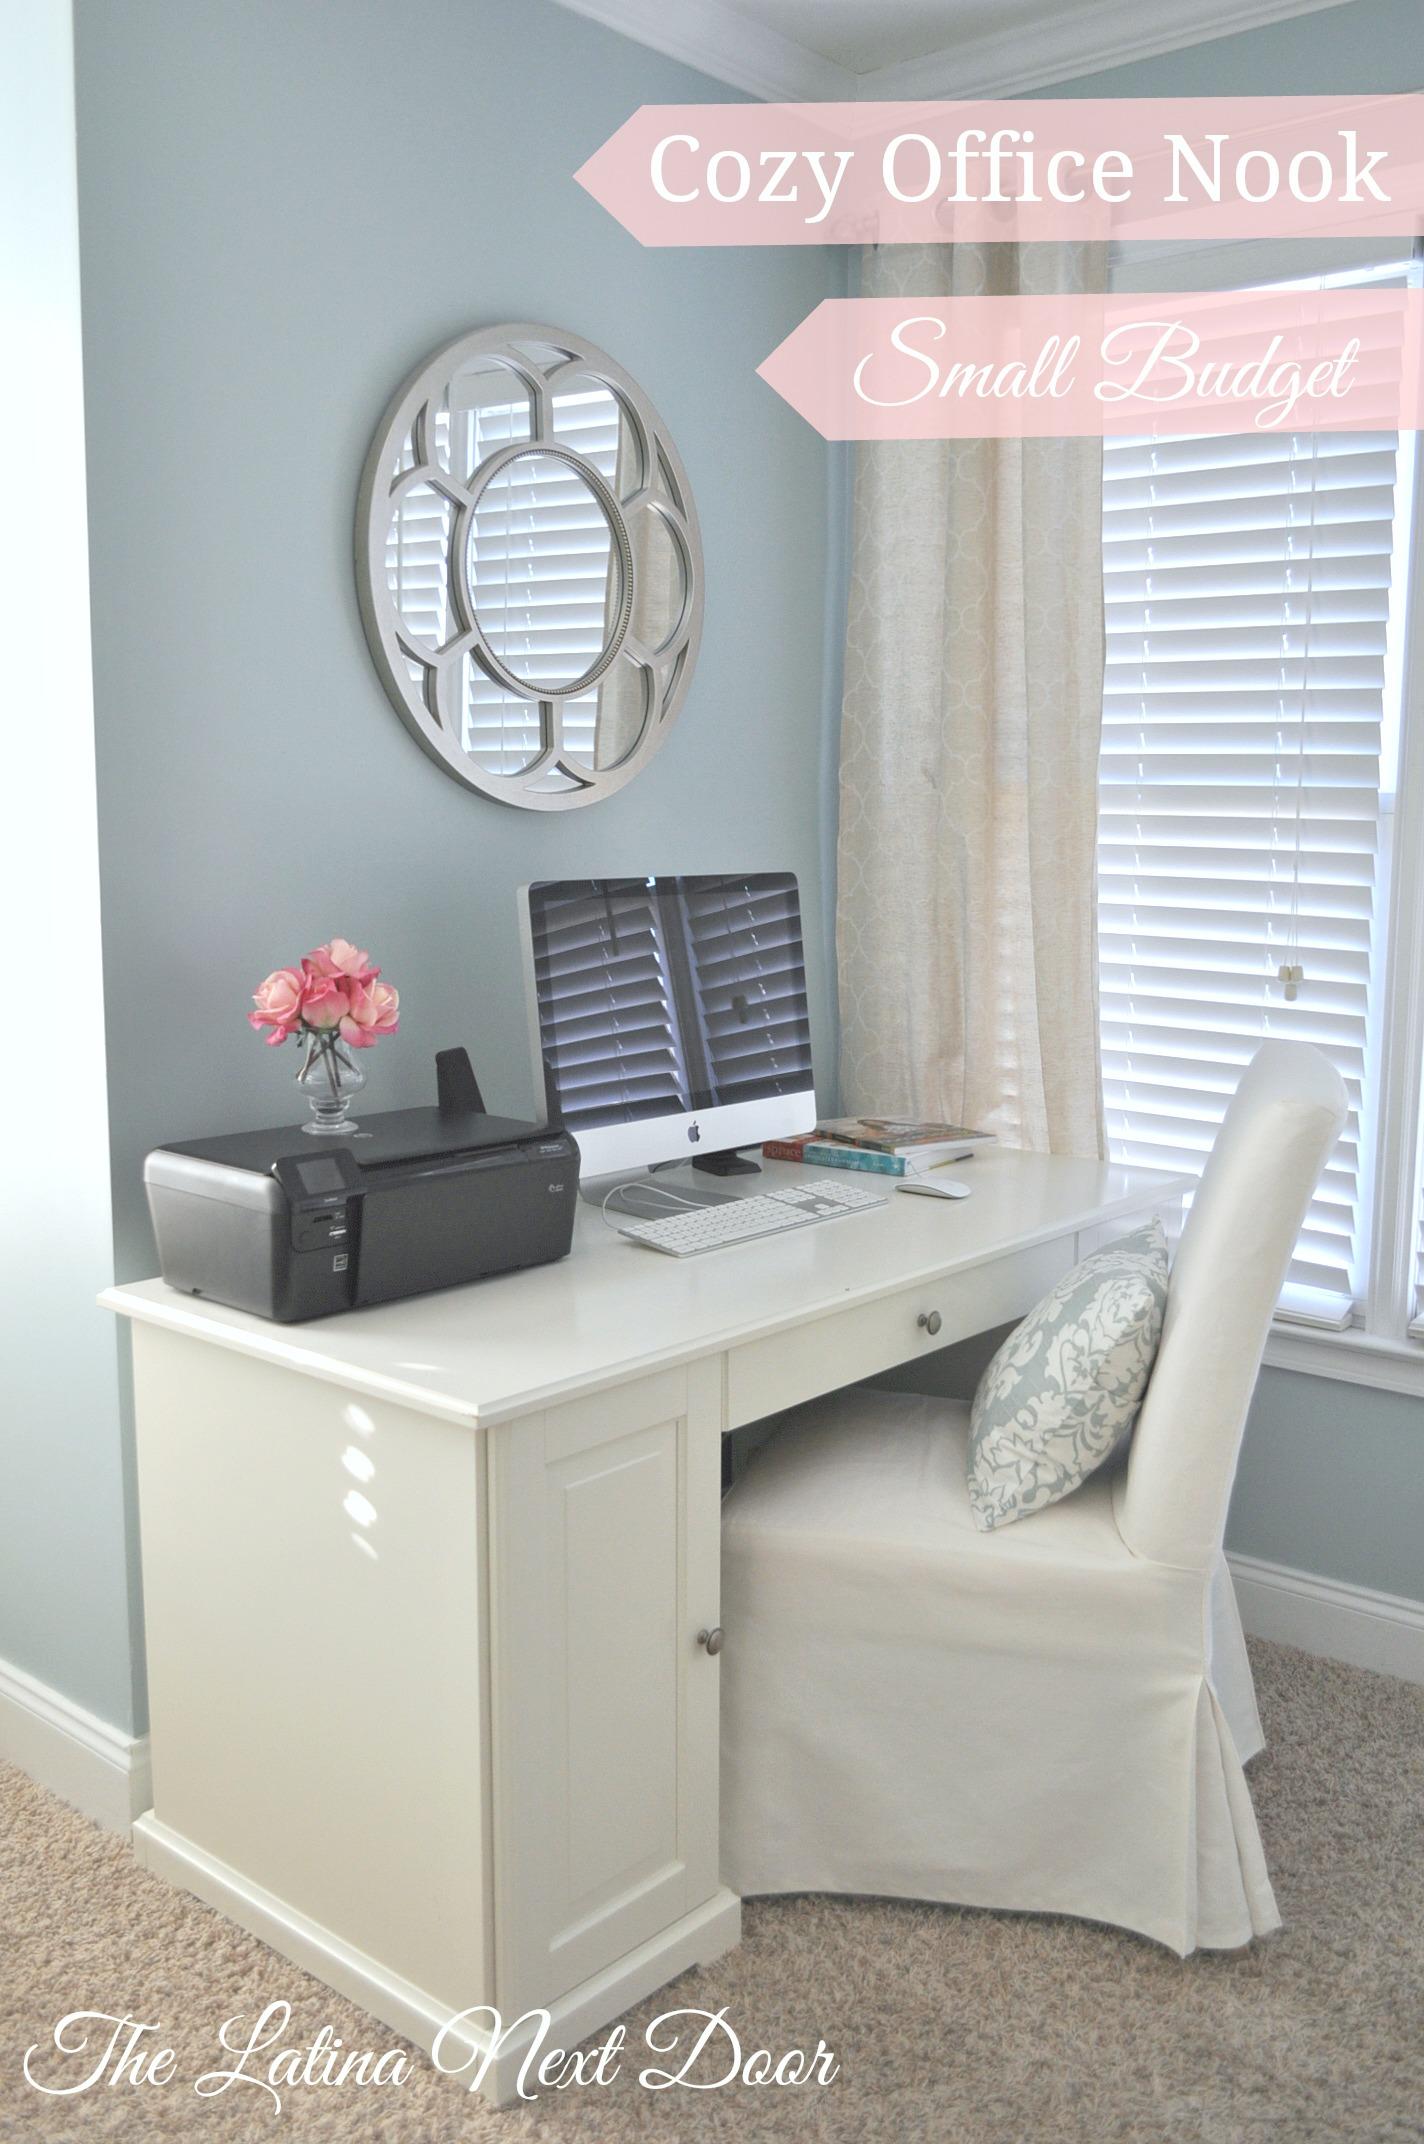 Cozy Office Nook Small Budget The Latina Next Door